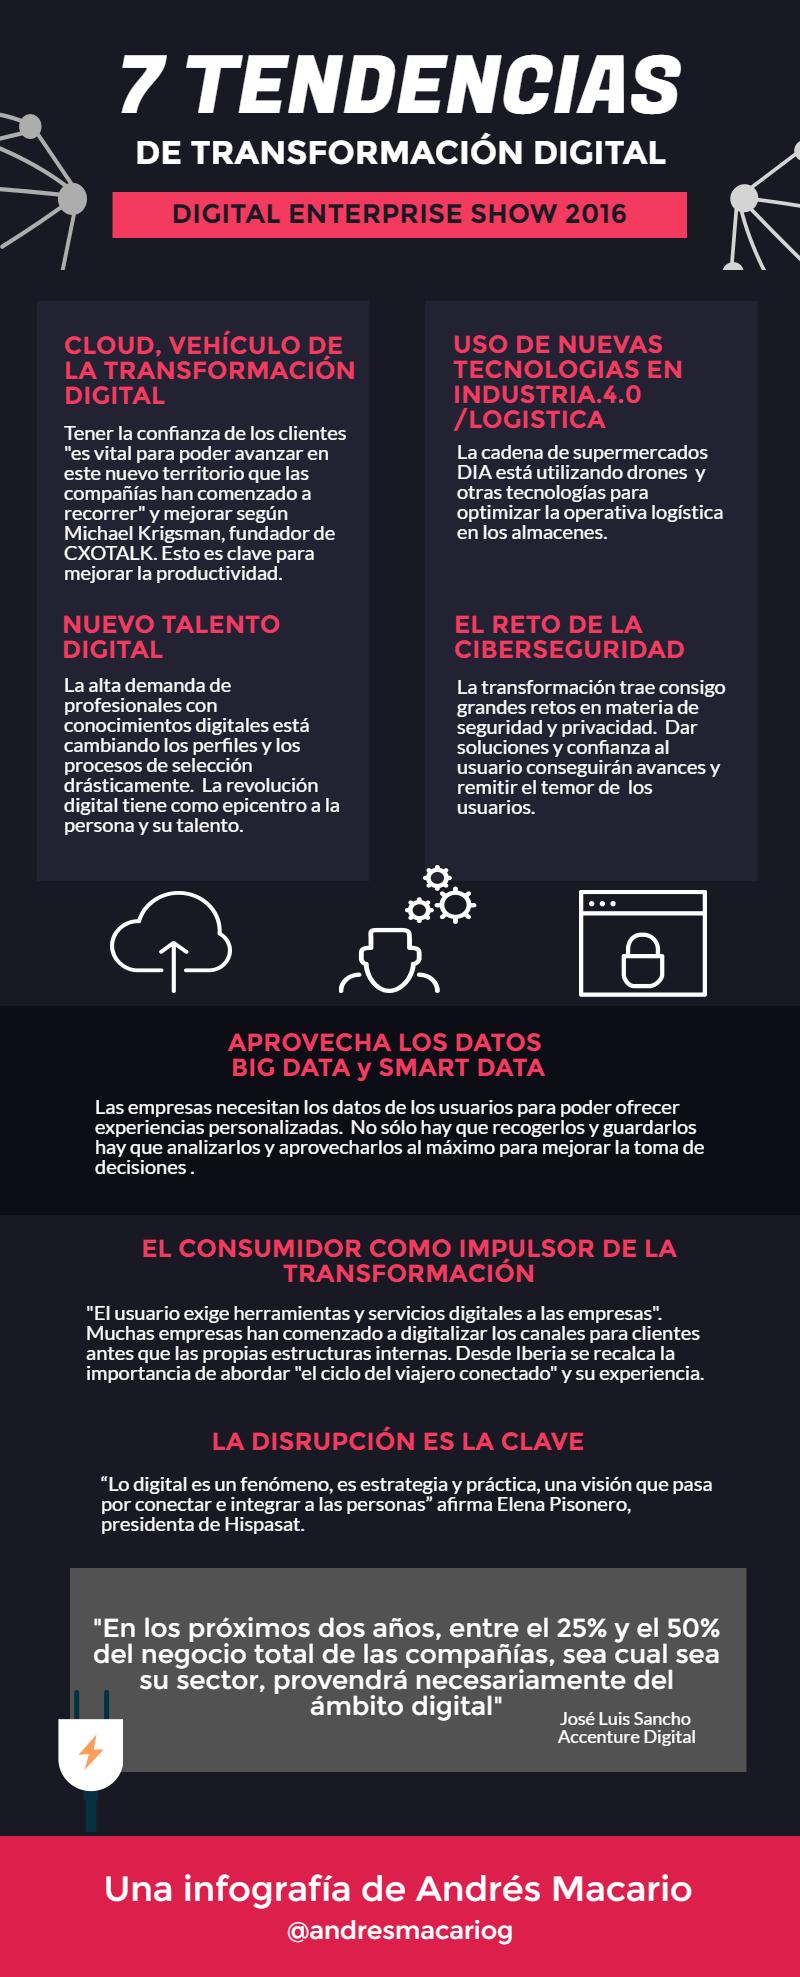 7 Tendencias de Transformacion Digital Infografia Andres Macario